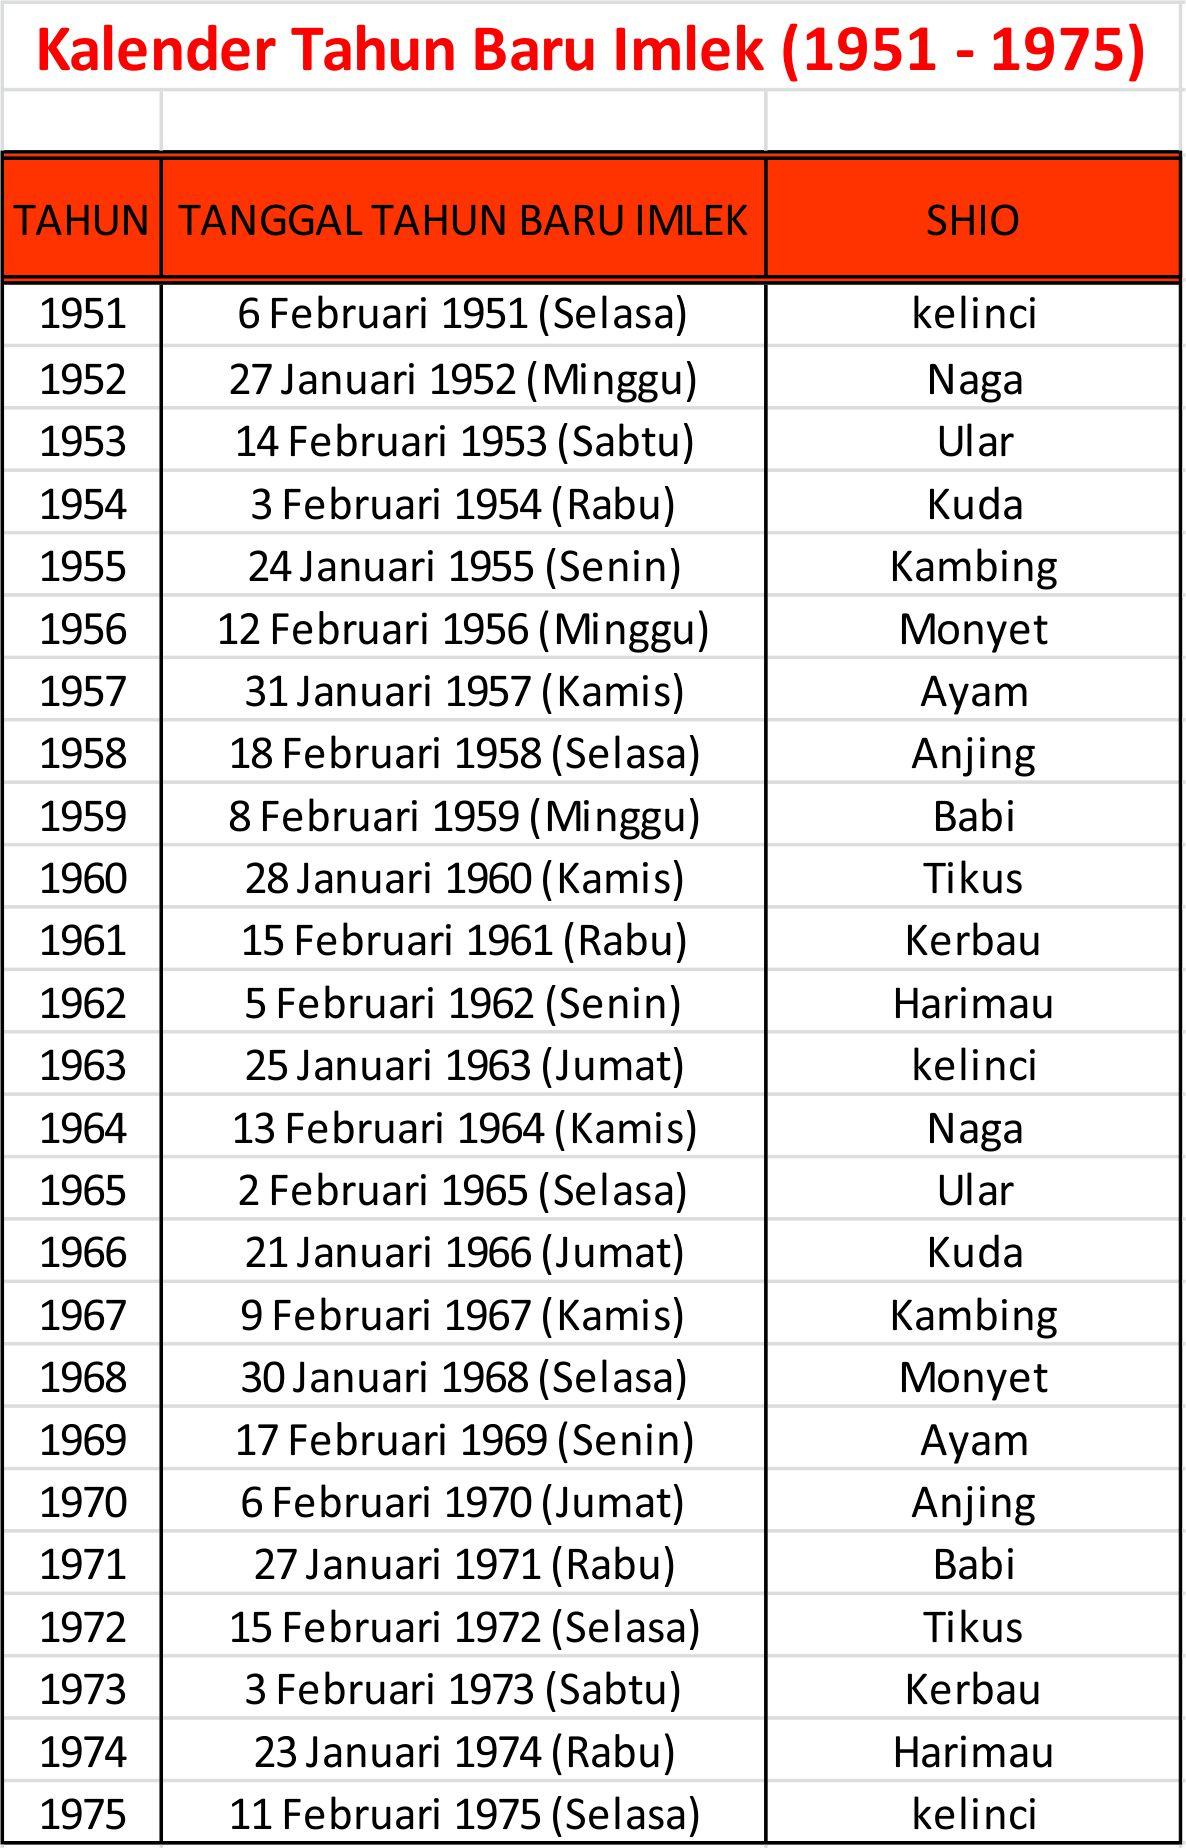 Kalender Tahun Baru Imlek (1951 - 1975)